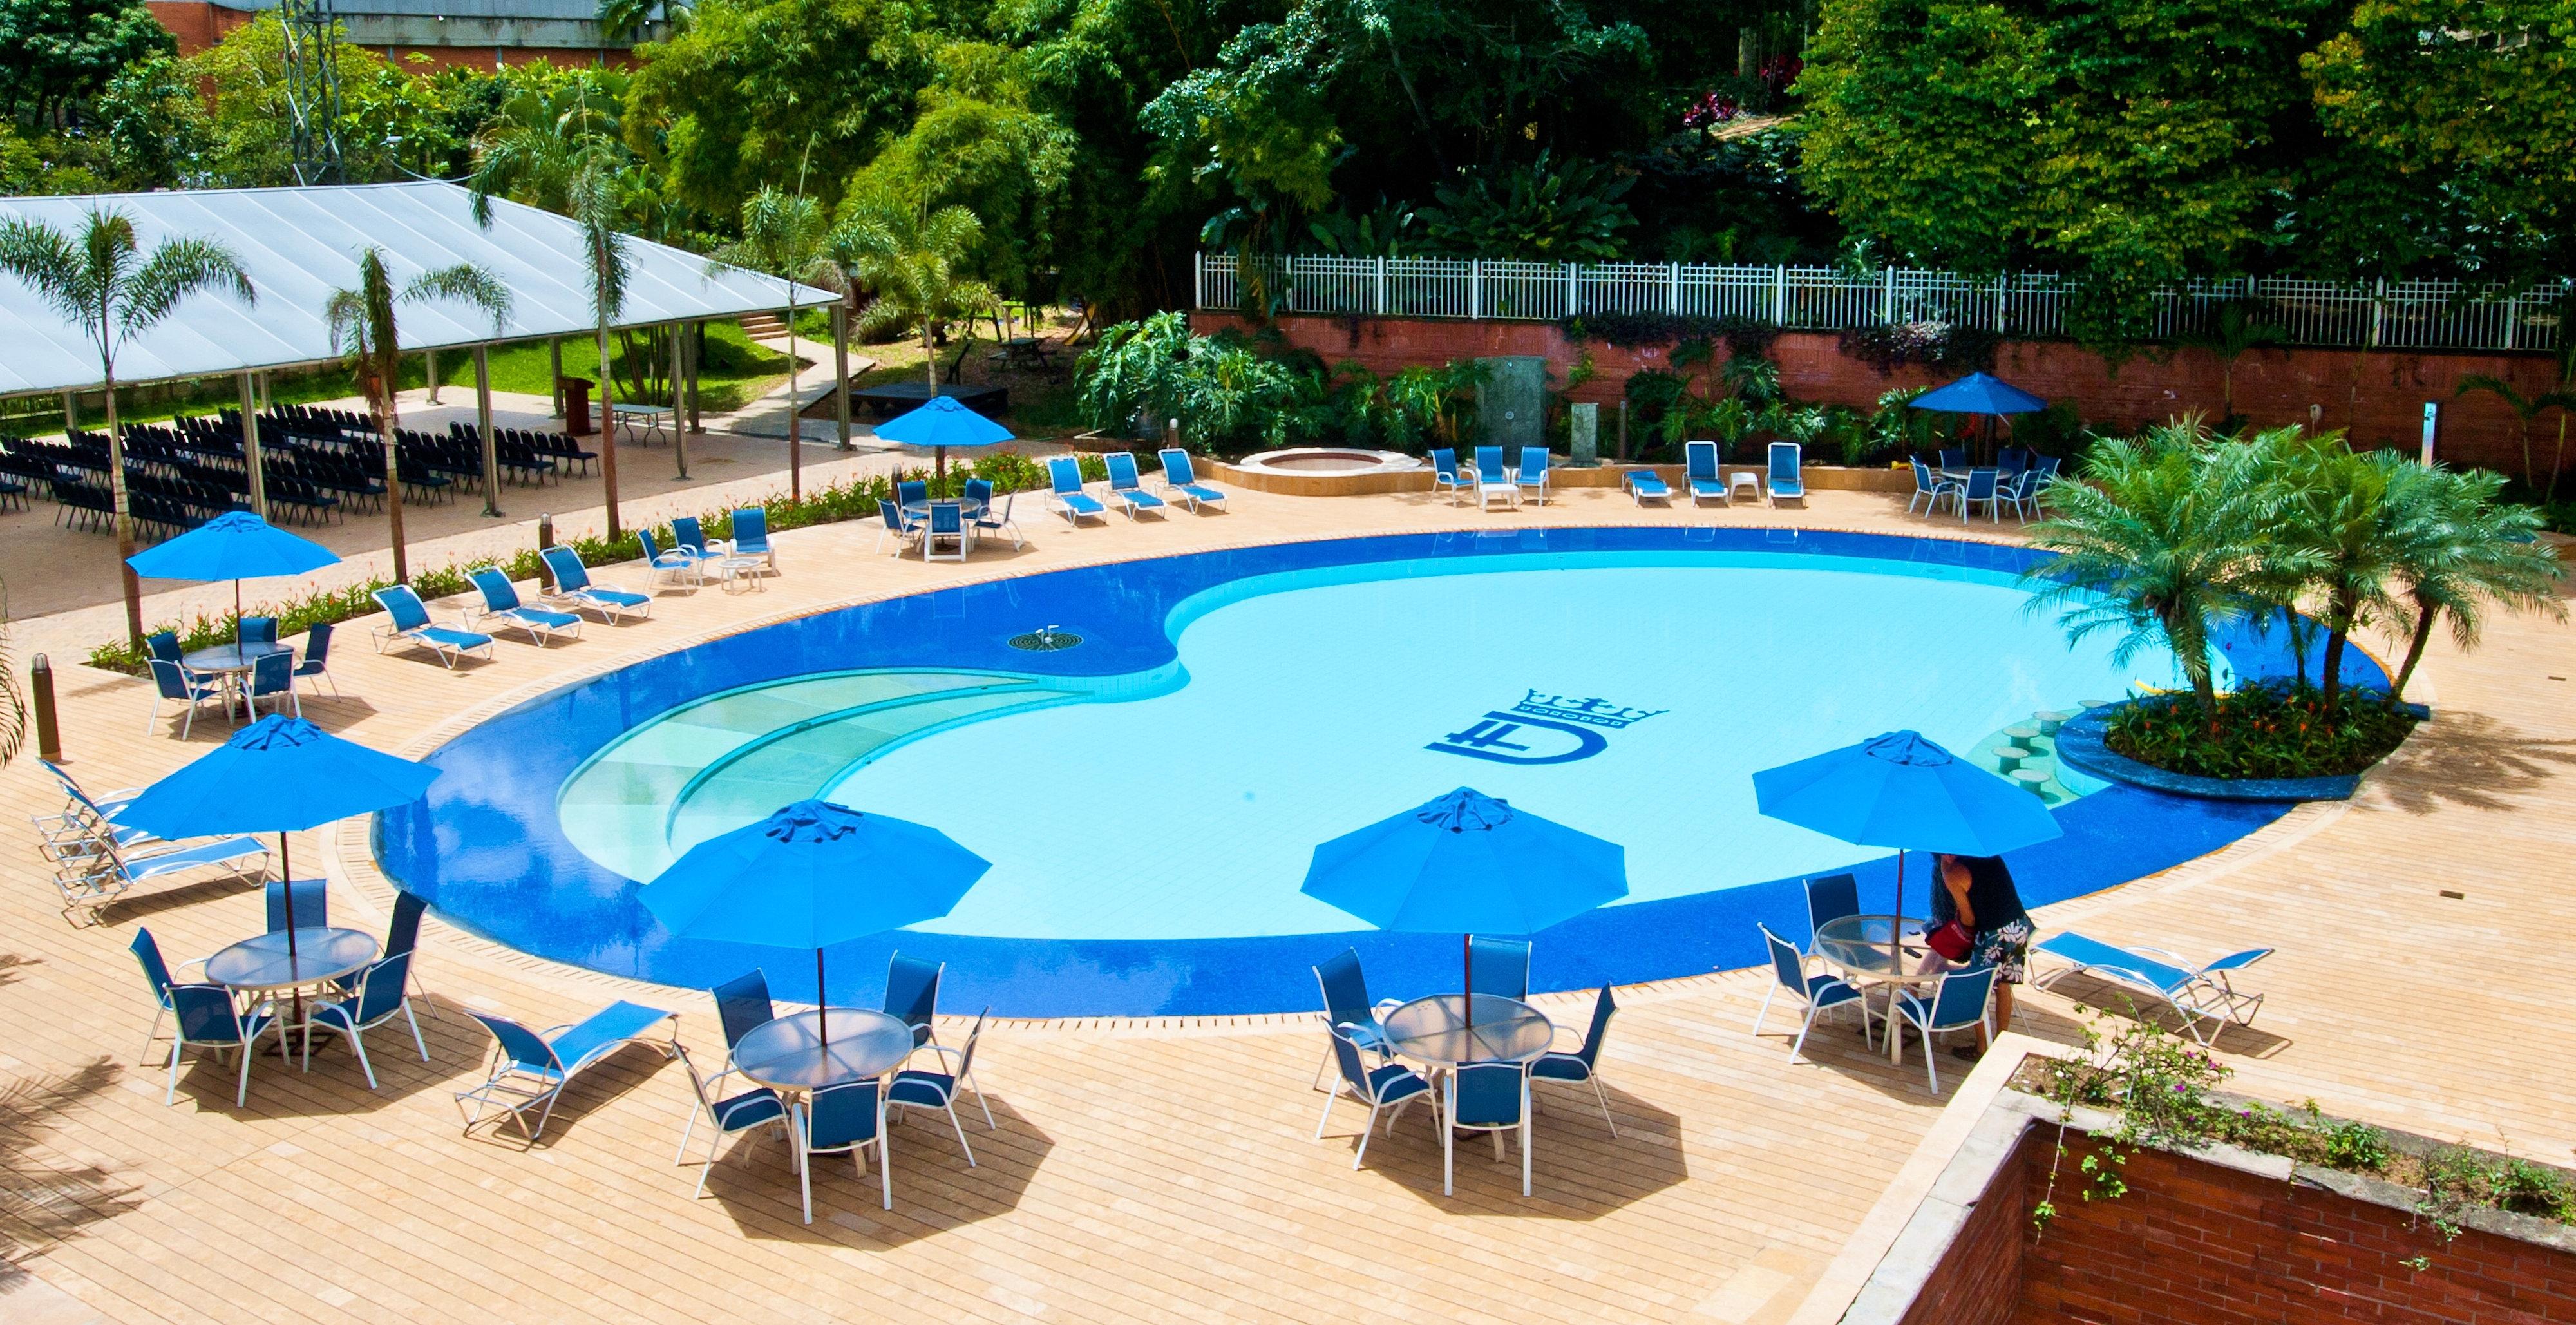 Hoteles en medellin 5 estrellas hotel dann carlton for Hoteles en portonovo con piscina